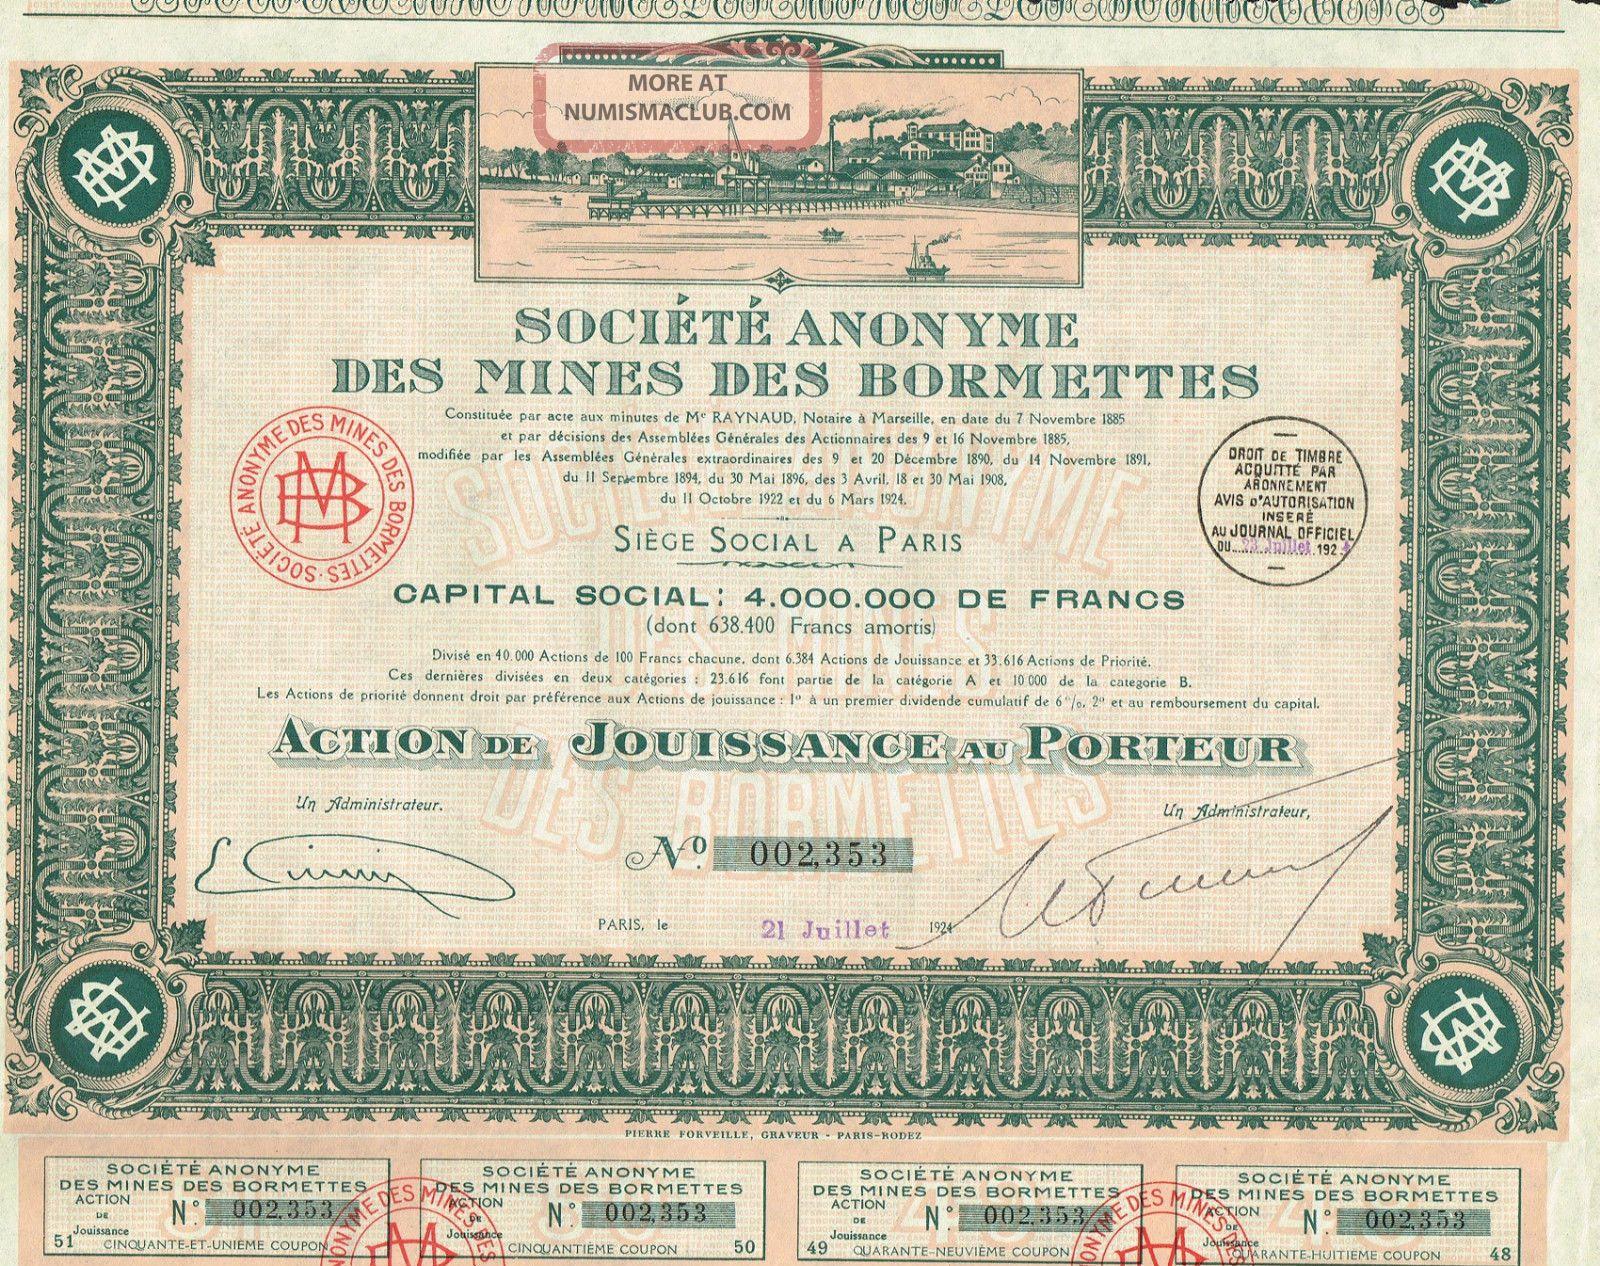 France Bormettes Mines Company Stock Certificate 1924 World photo